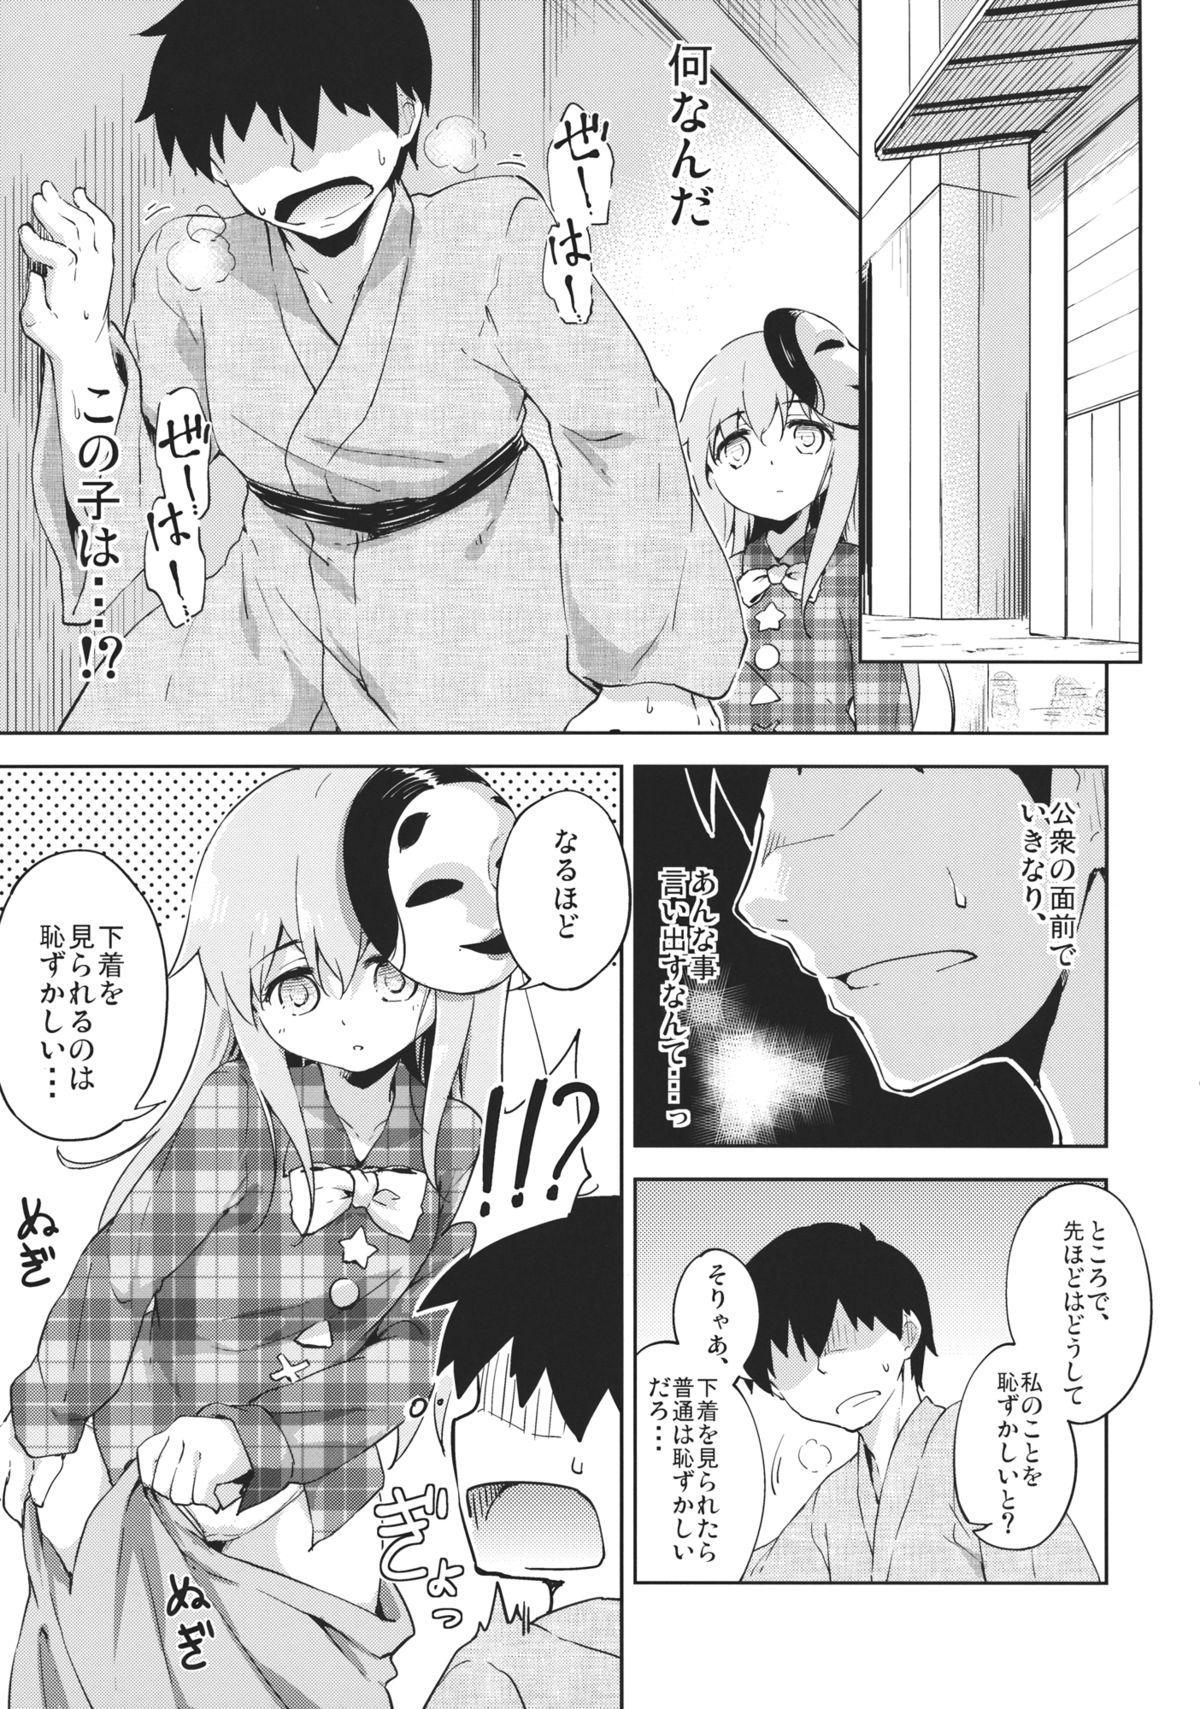 Kokoro, Sarakedashite 7